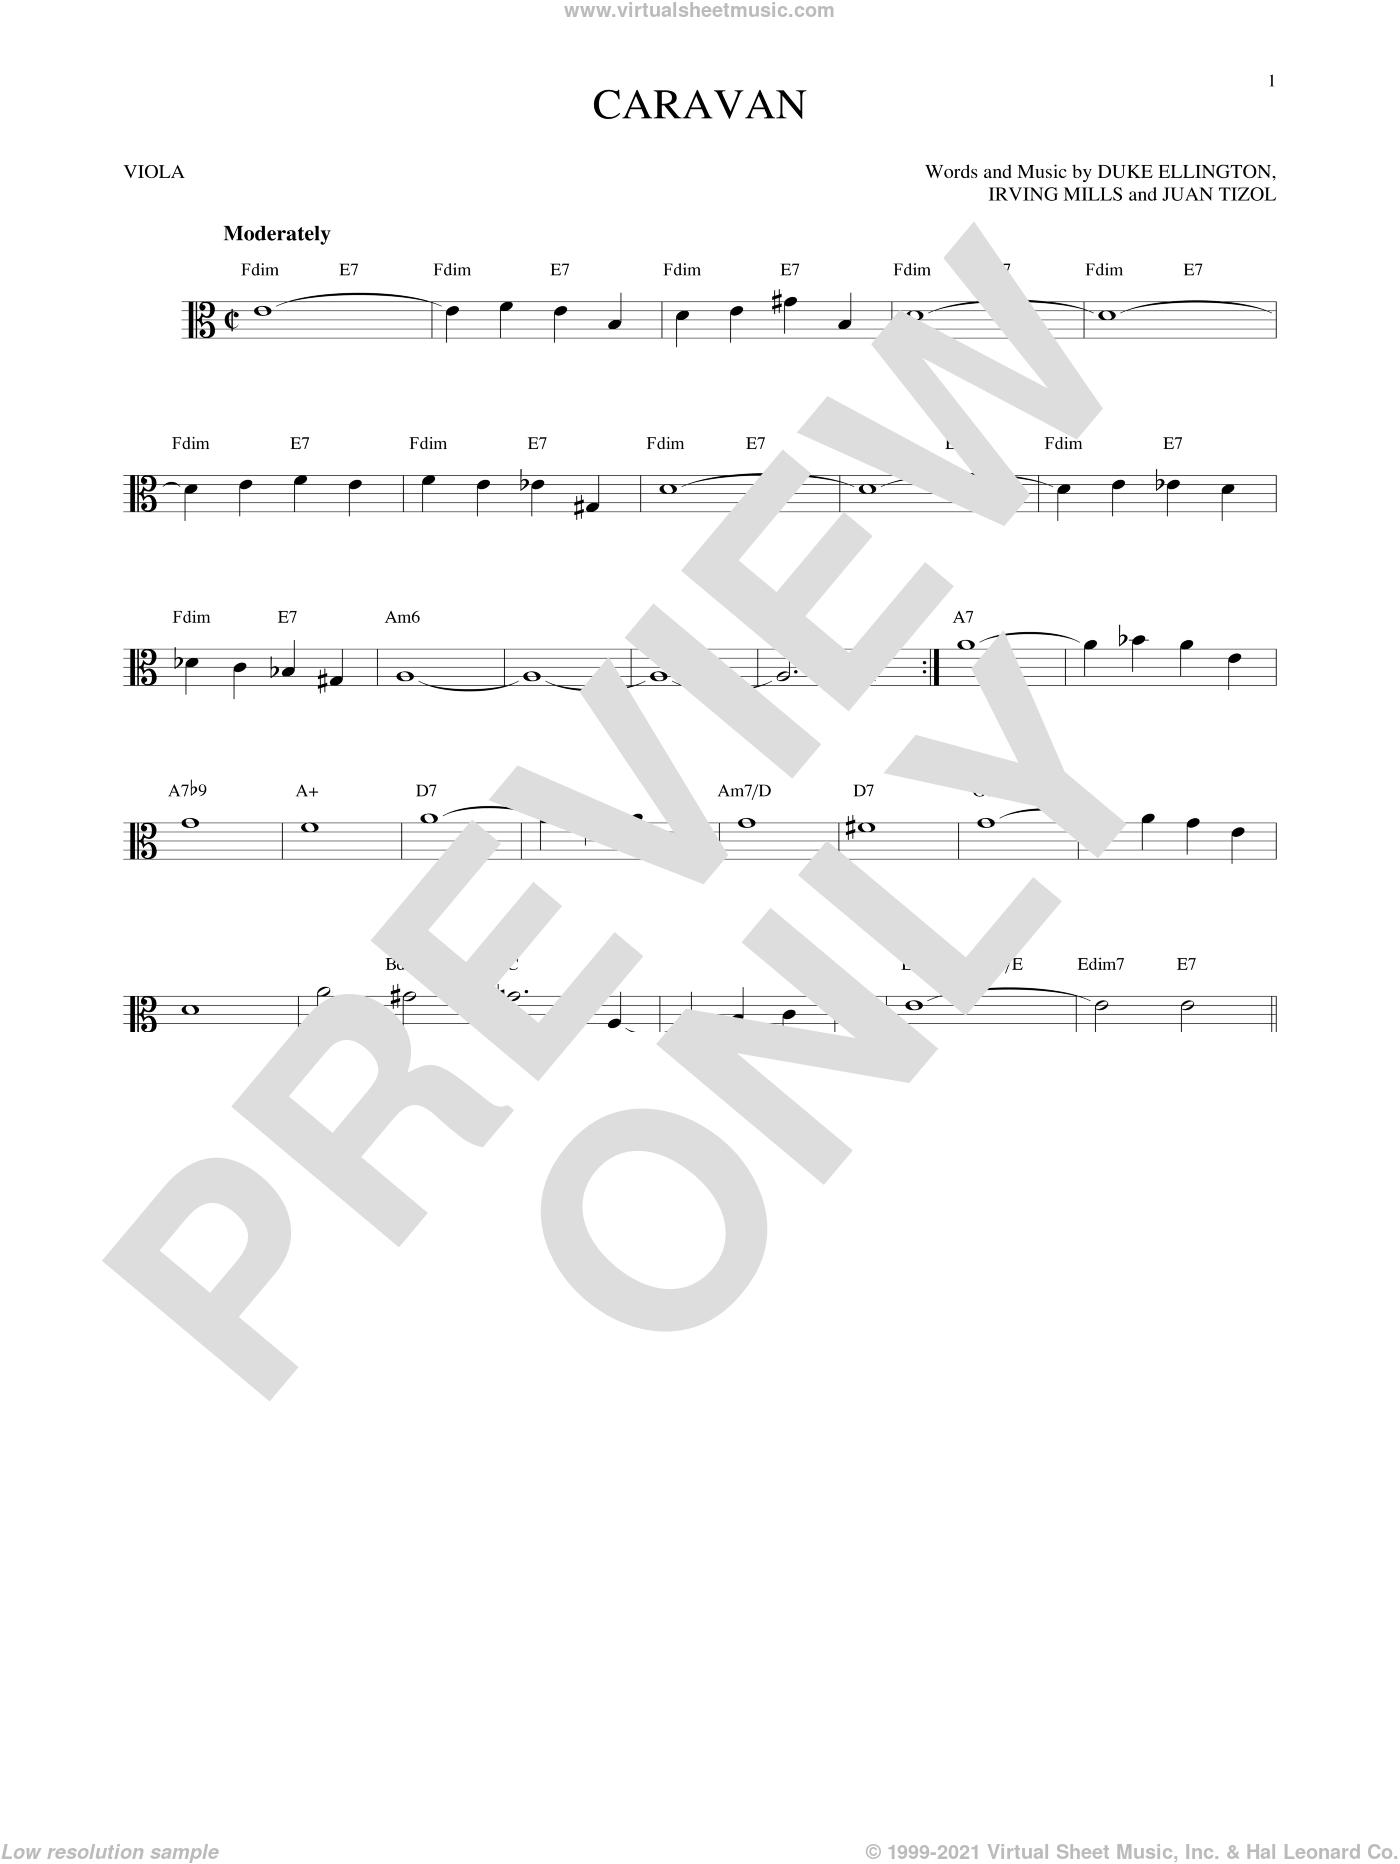 Caravan sheet music for viola solo by Duke Ellington, Billy Eckstine, Duke Ellington and his Orchestra, Ralph Marterie, Irving Mills, Juan Tizol and Juan Tizol & Duke Ellington, intermediate skill level